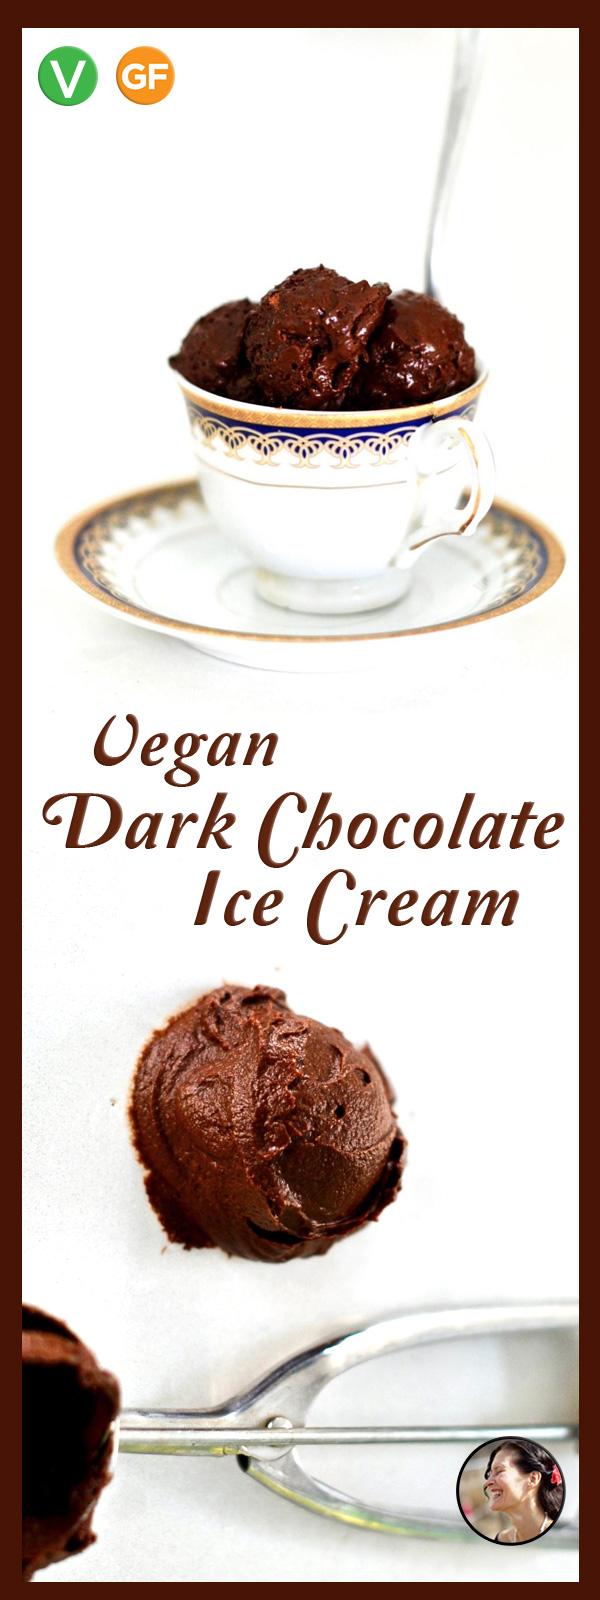 Deep Dark Vegan Chocolate Ice Cream with Aquafaba